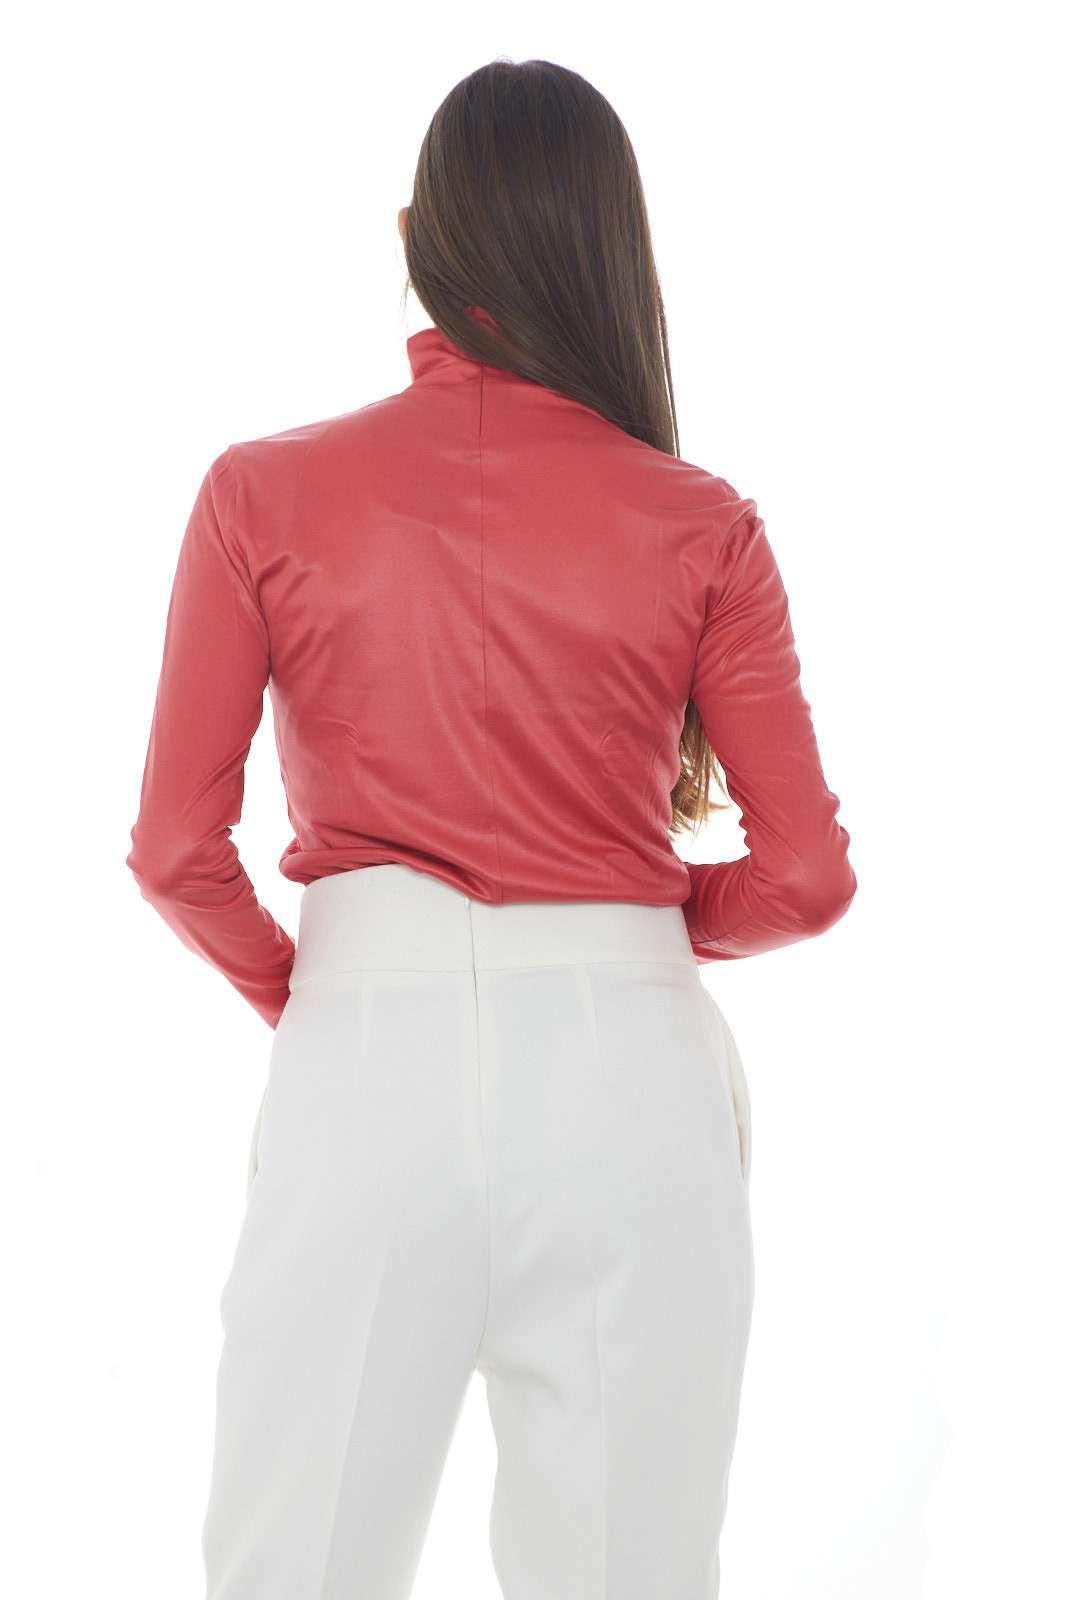 https://www.parmax.com/media/catalog/product/a/i/AI-outlet_parmax-maglia-donna-Pinko-1G14BF-C.jpg